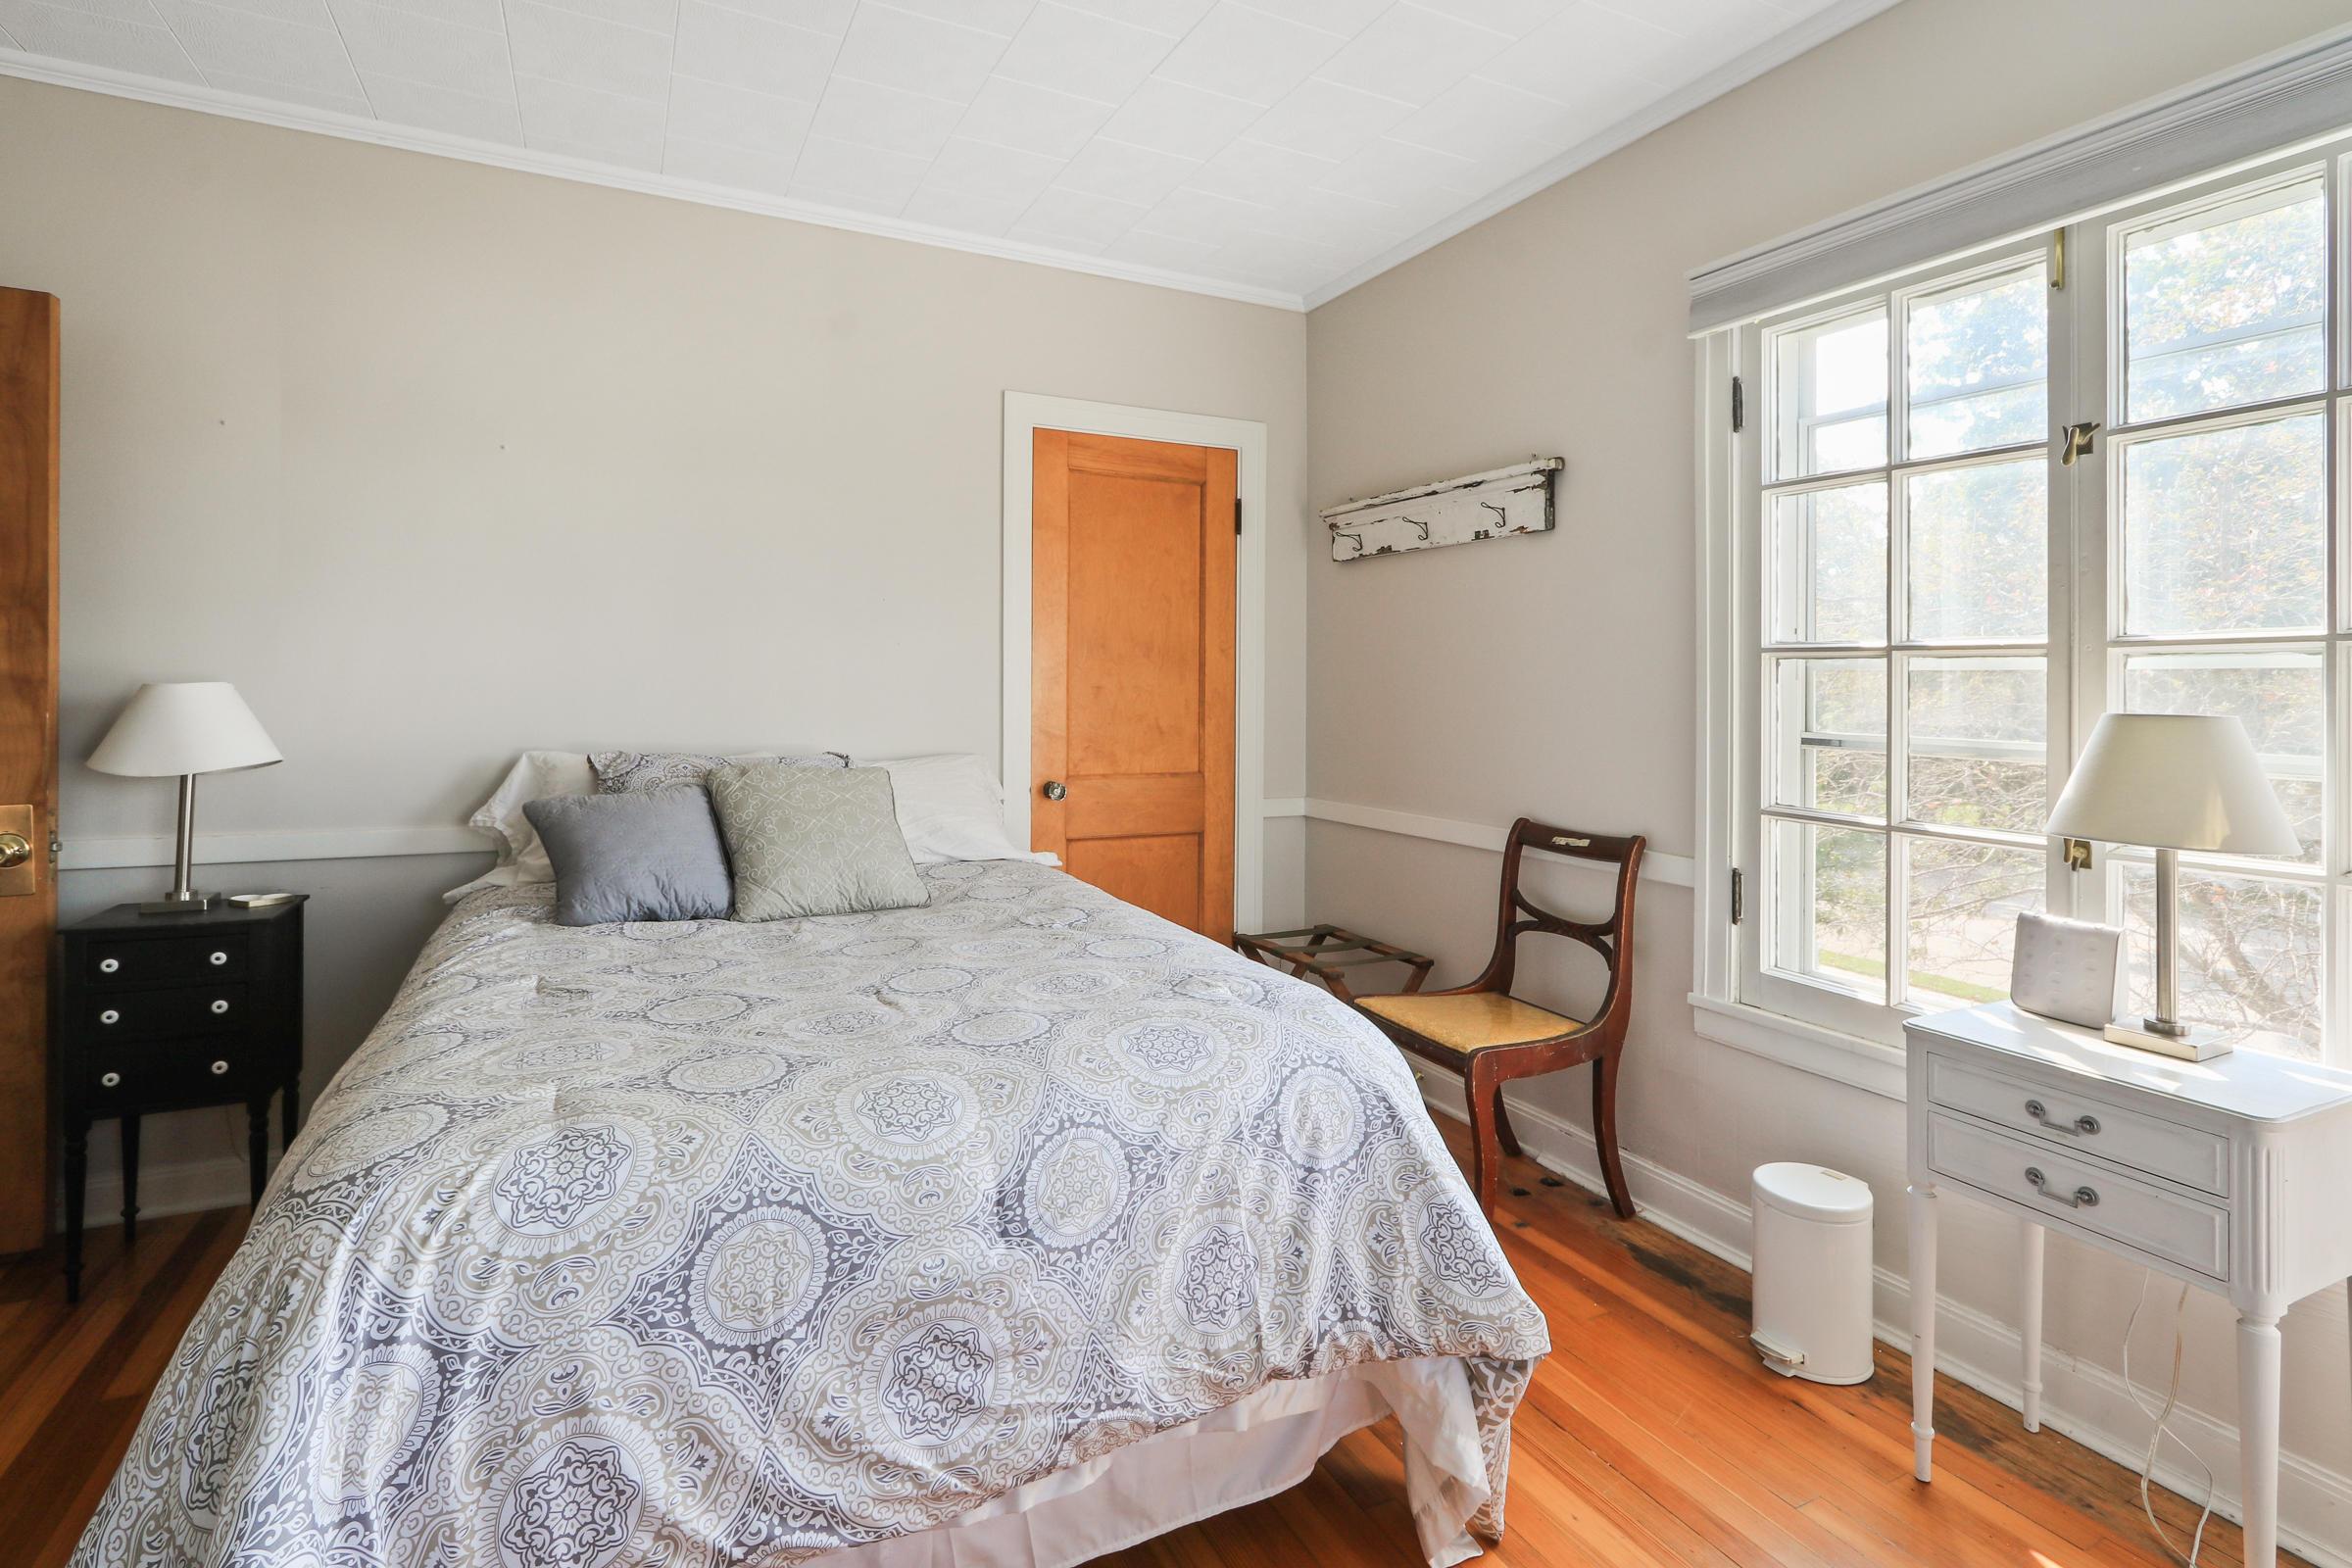 130 Kenosha St, Walworth, Wisconsin 53184, 5 Bedrooms Bedrooms, 16 Rooms Rooms,3 BathroomsBathrooms,Single-family,For Sale,Kenosha St,1712461